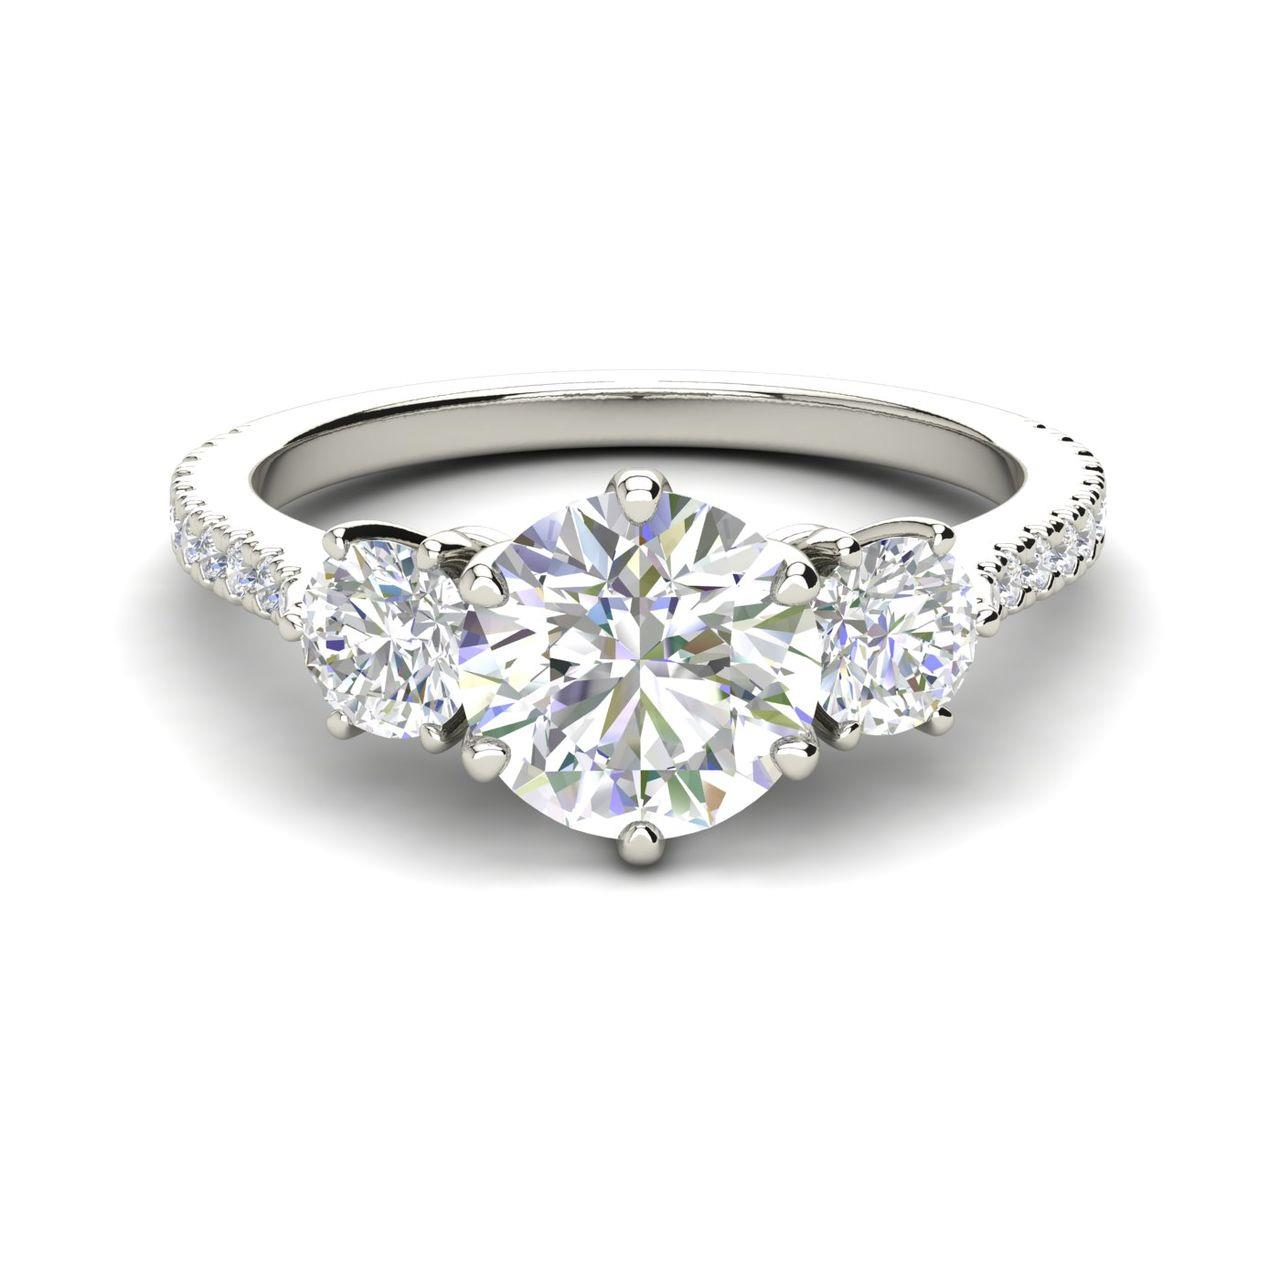 Pave 3 Stone 1.25 Carat Round Cut Diamond Engagement Ring